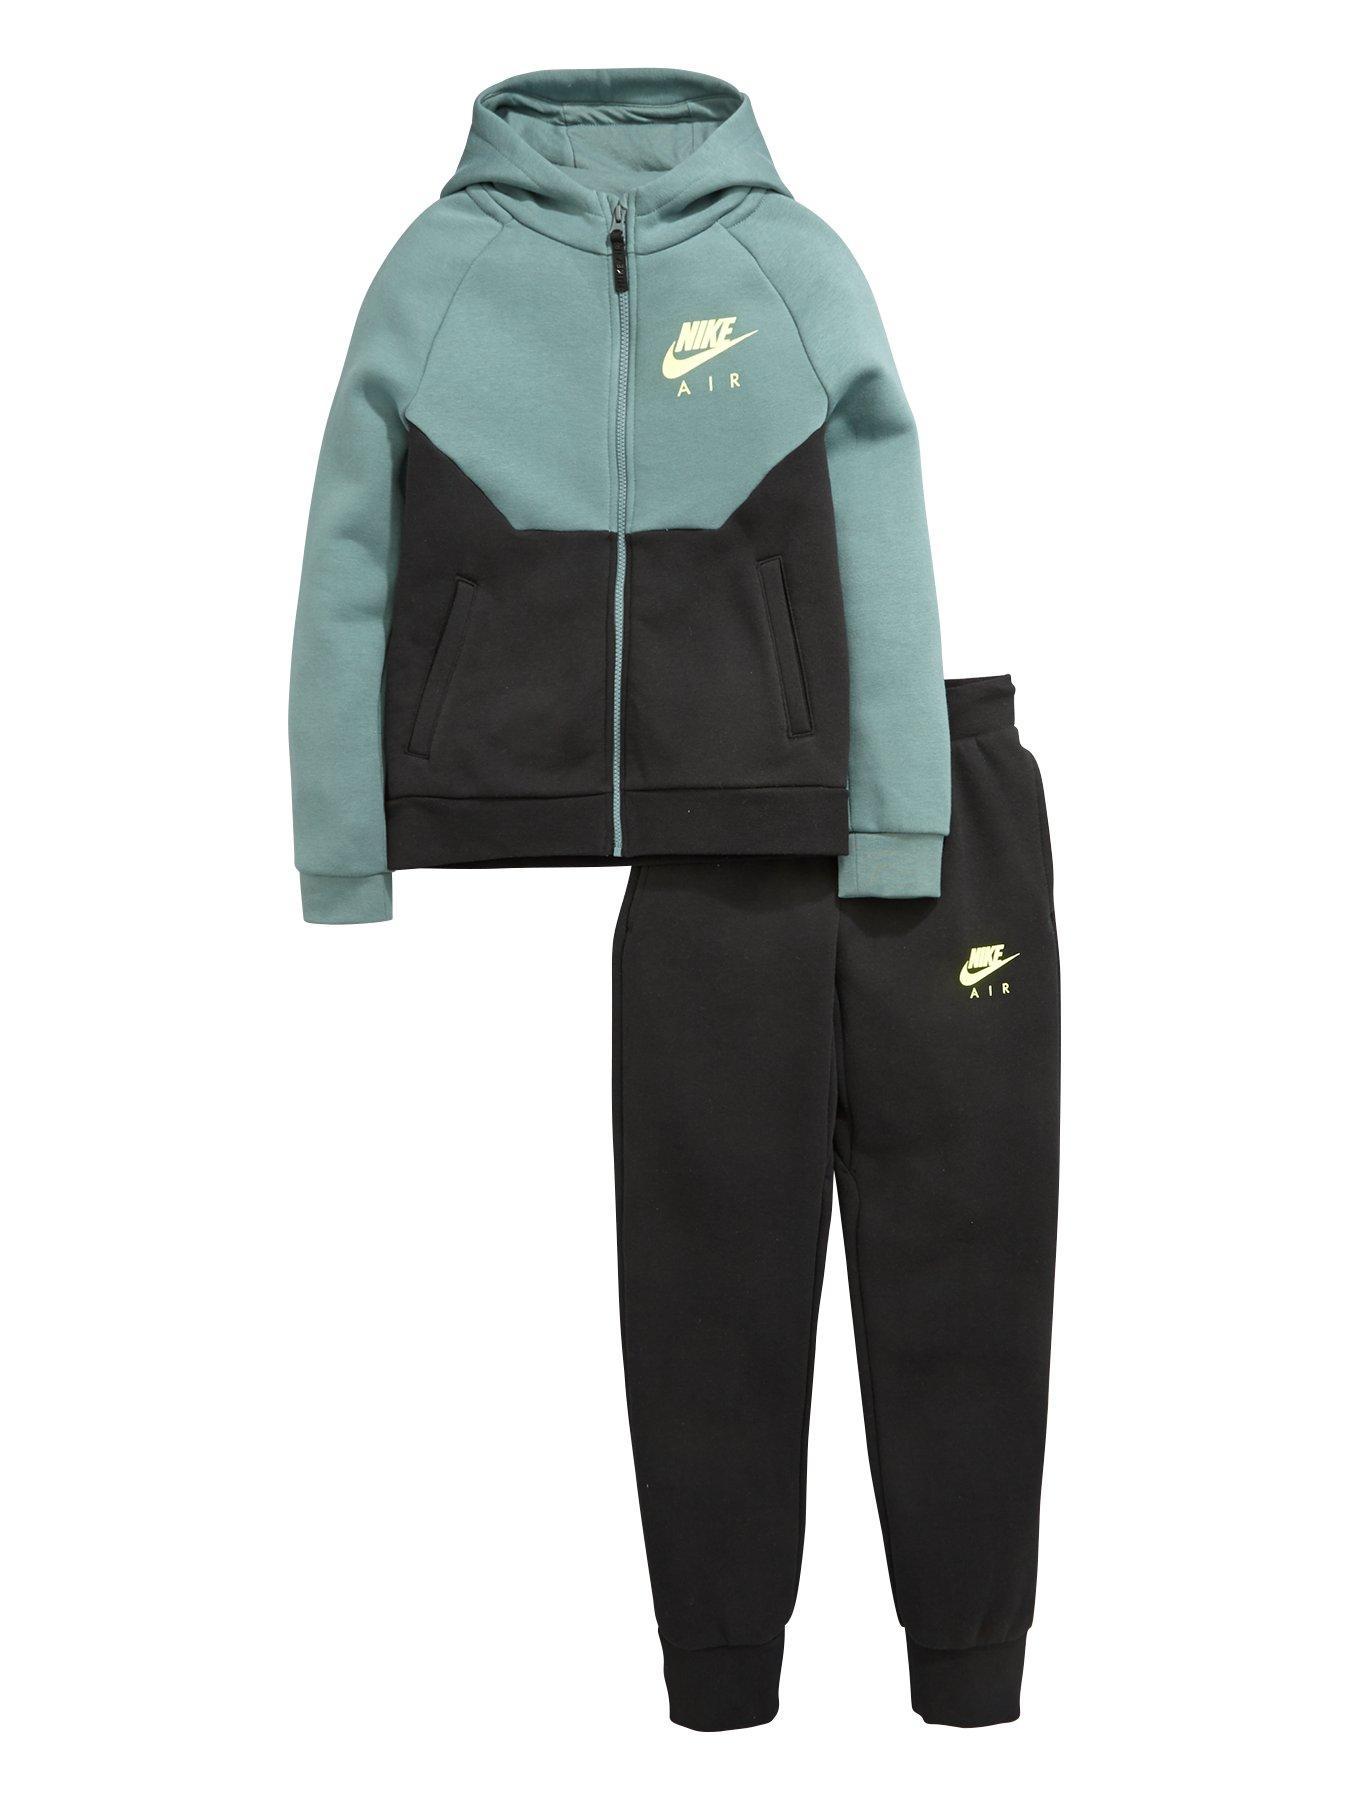 raadx Nike Air Older Boys Fleece Warm Up Tracksuit | littlewoods.com